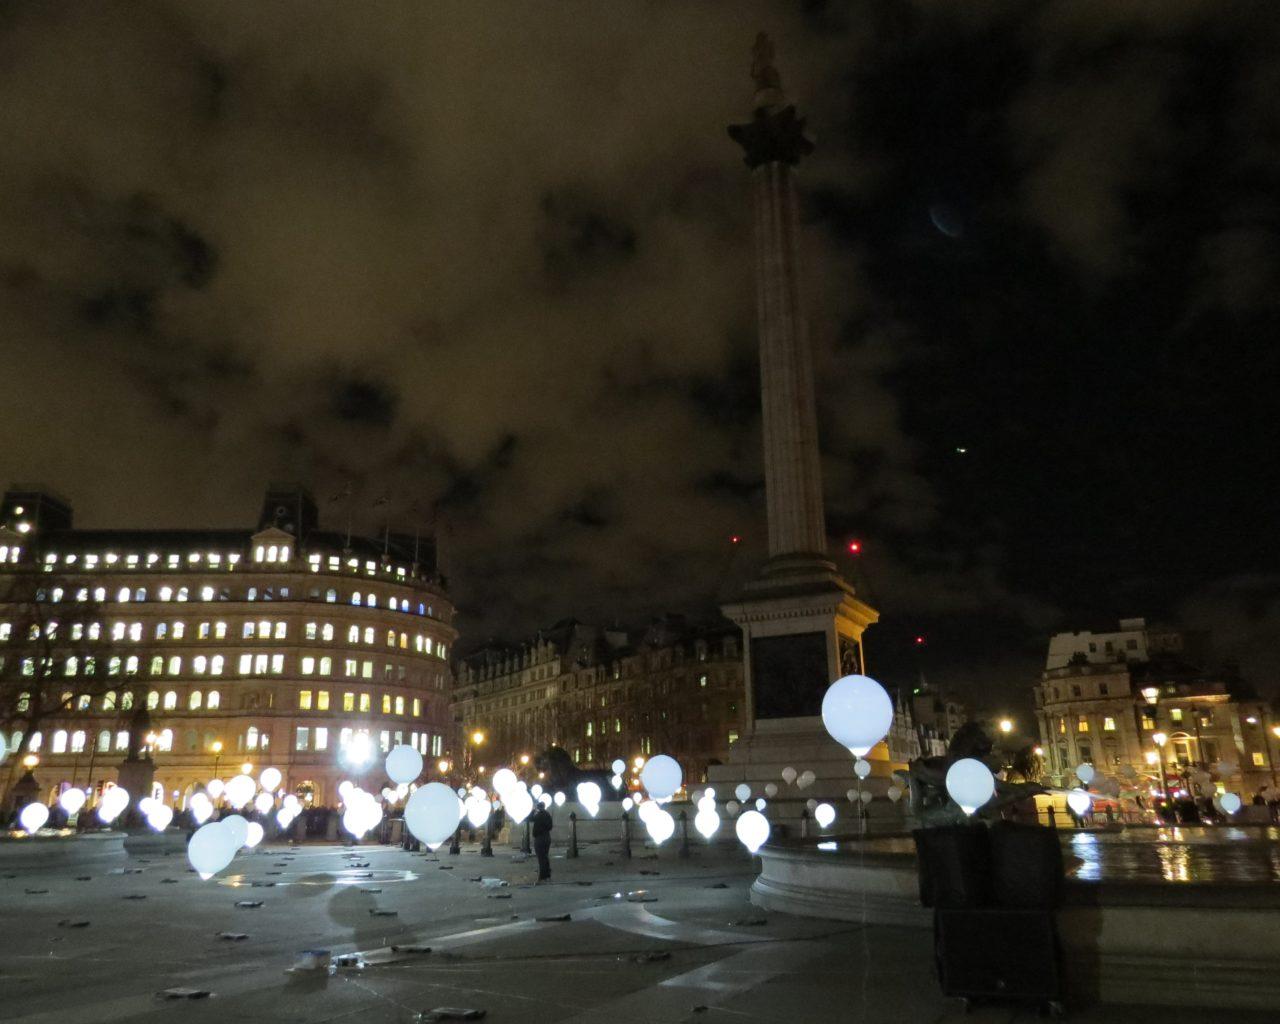 Child Hoood - Lumiere London 201